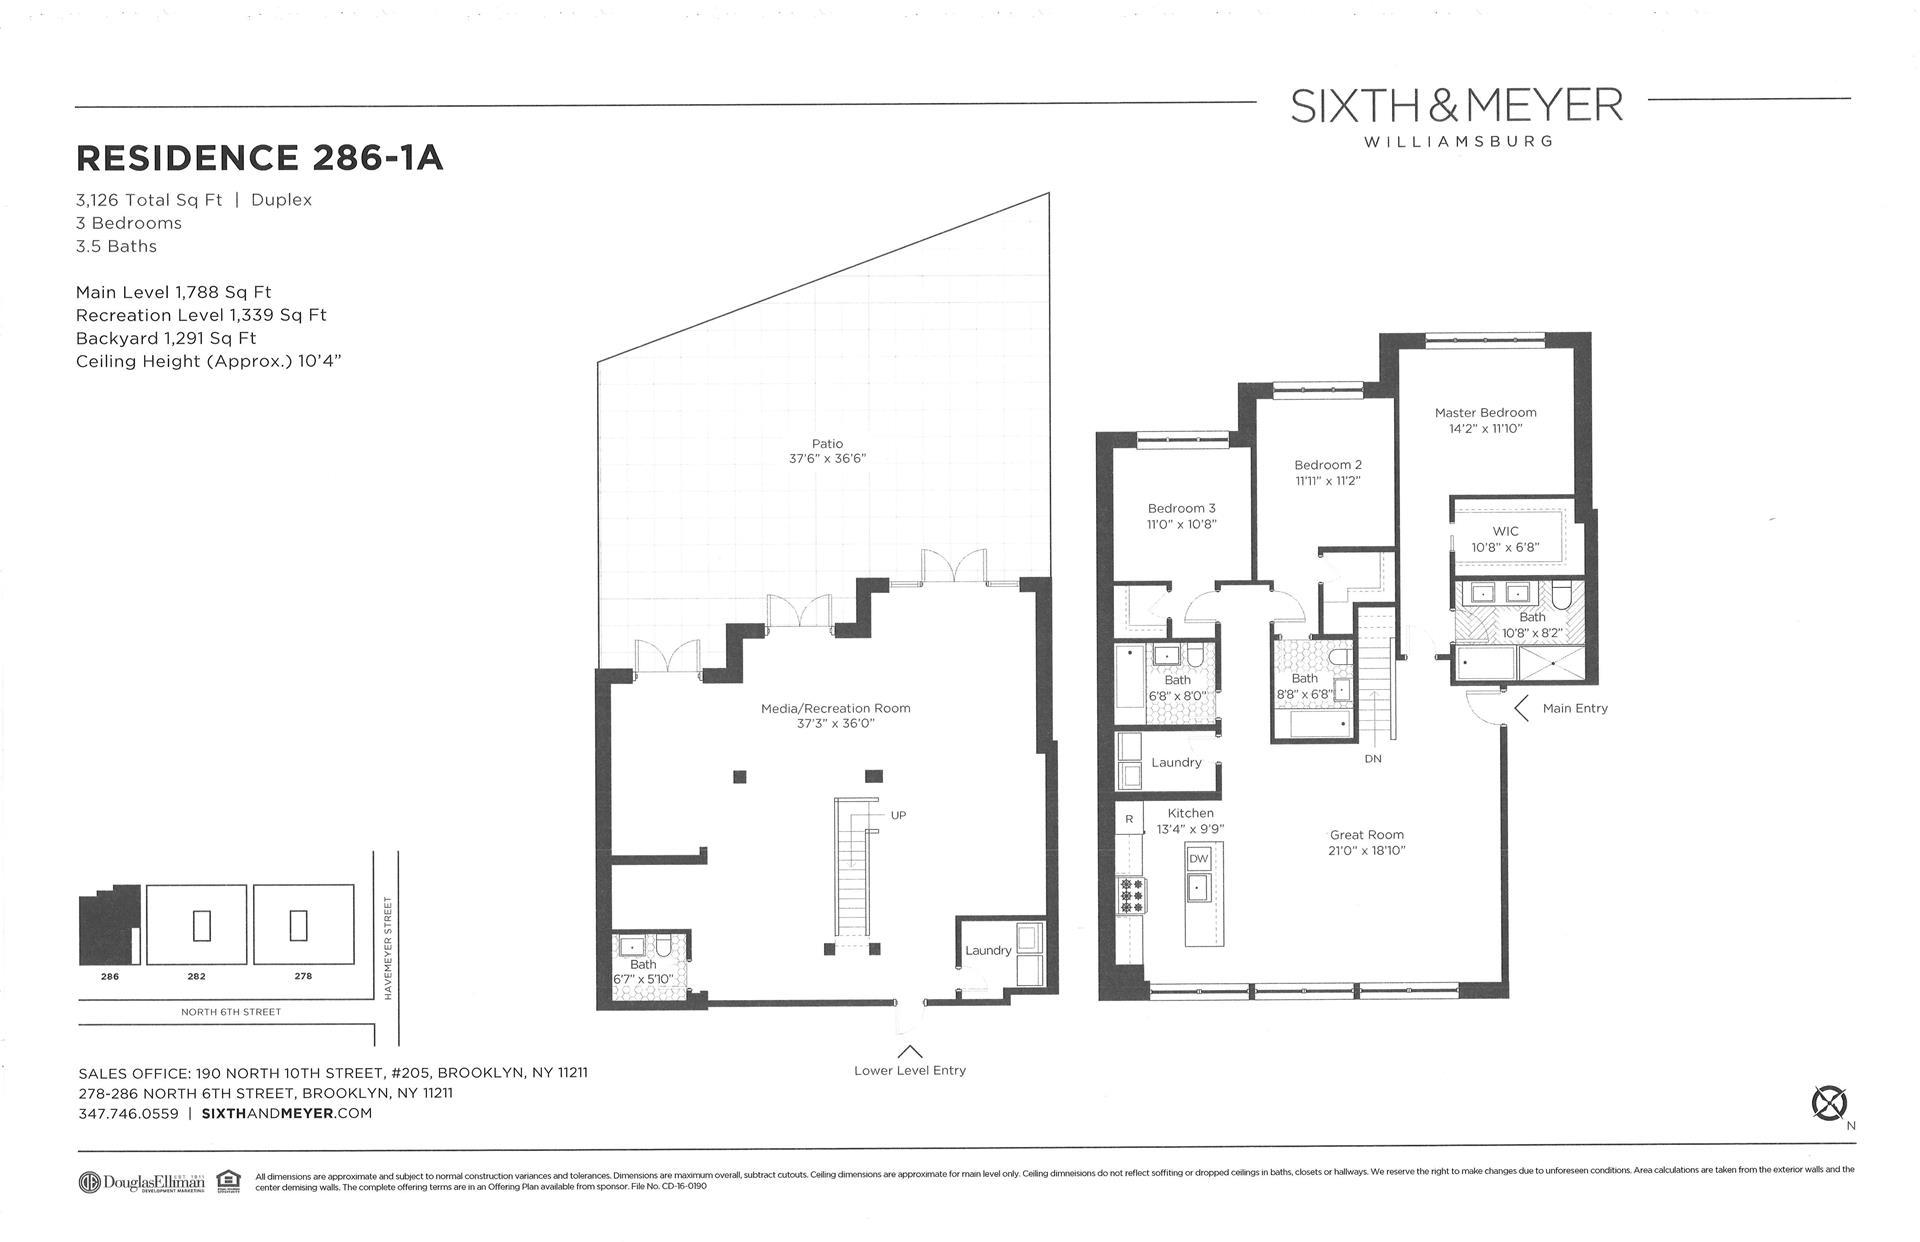 Floor plan of Sixth & Meyer, 278-286 North 6th Street, 286/1A - Williamsburg, New York